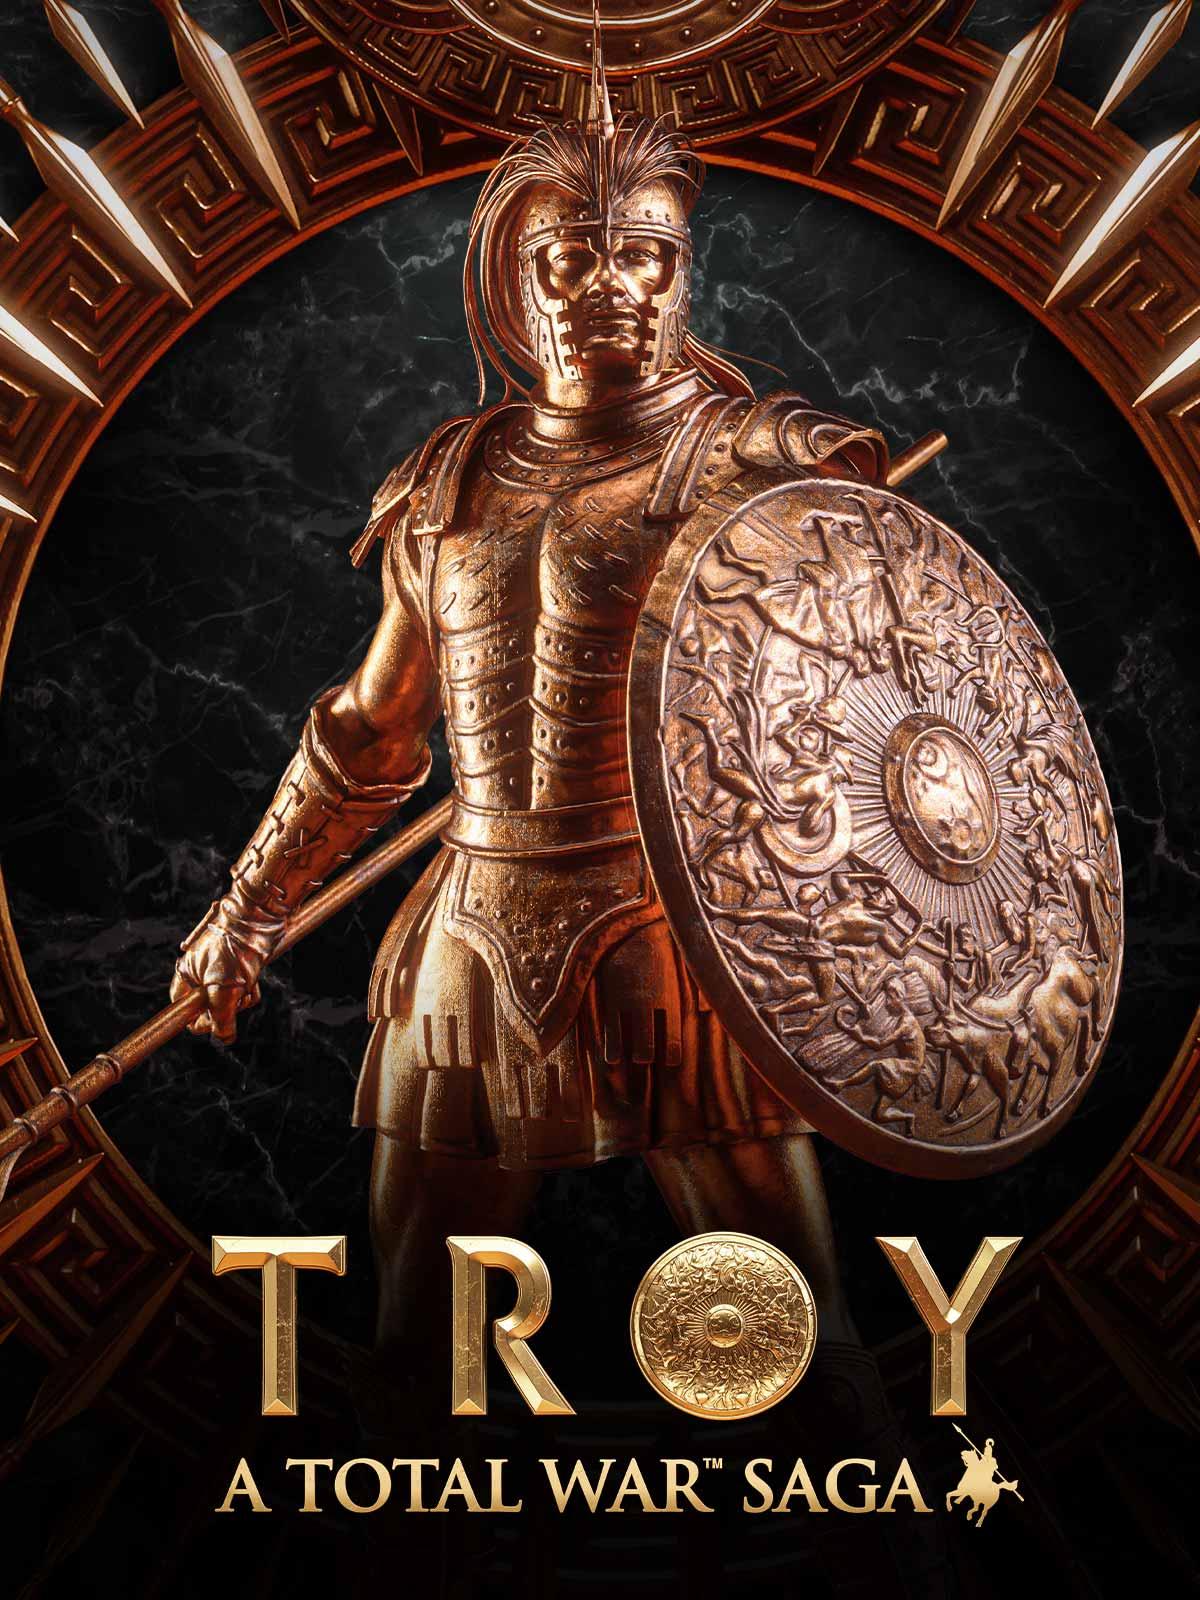 Total War Saga: Troy kostenlos im Epic Store am 13.08.2020